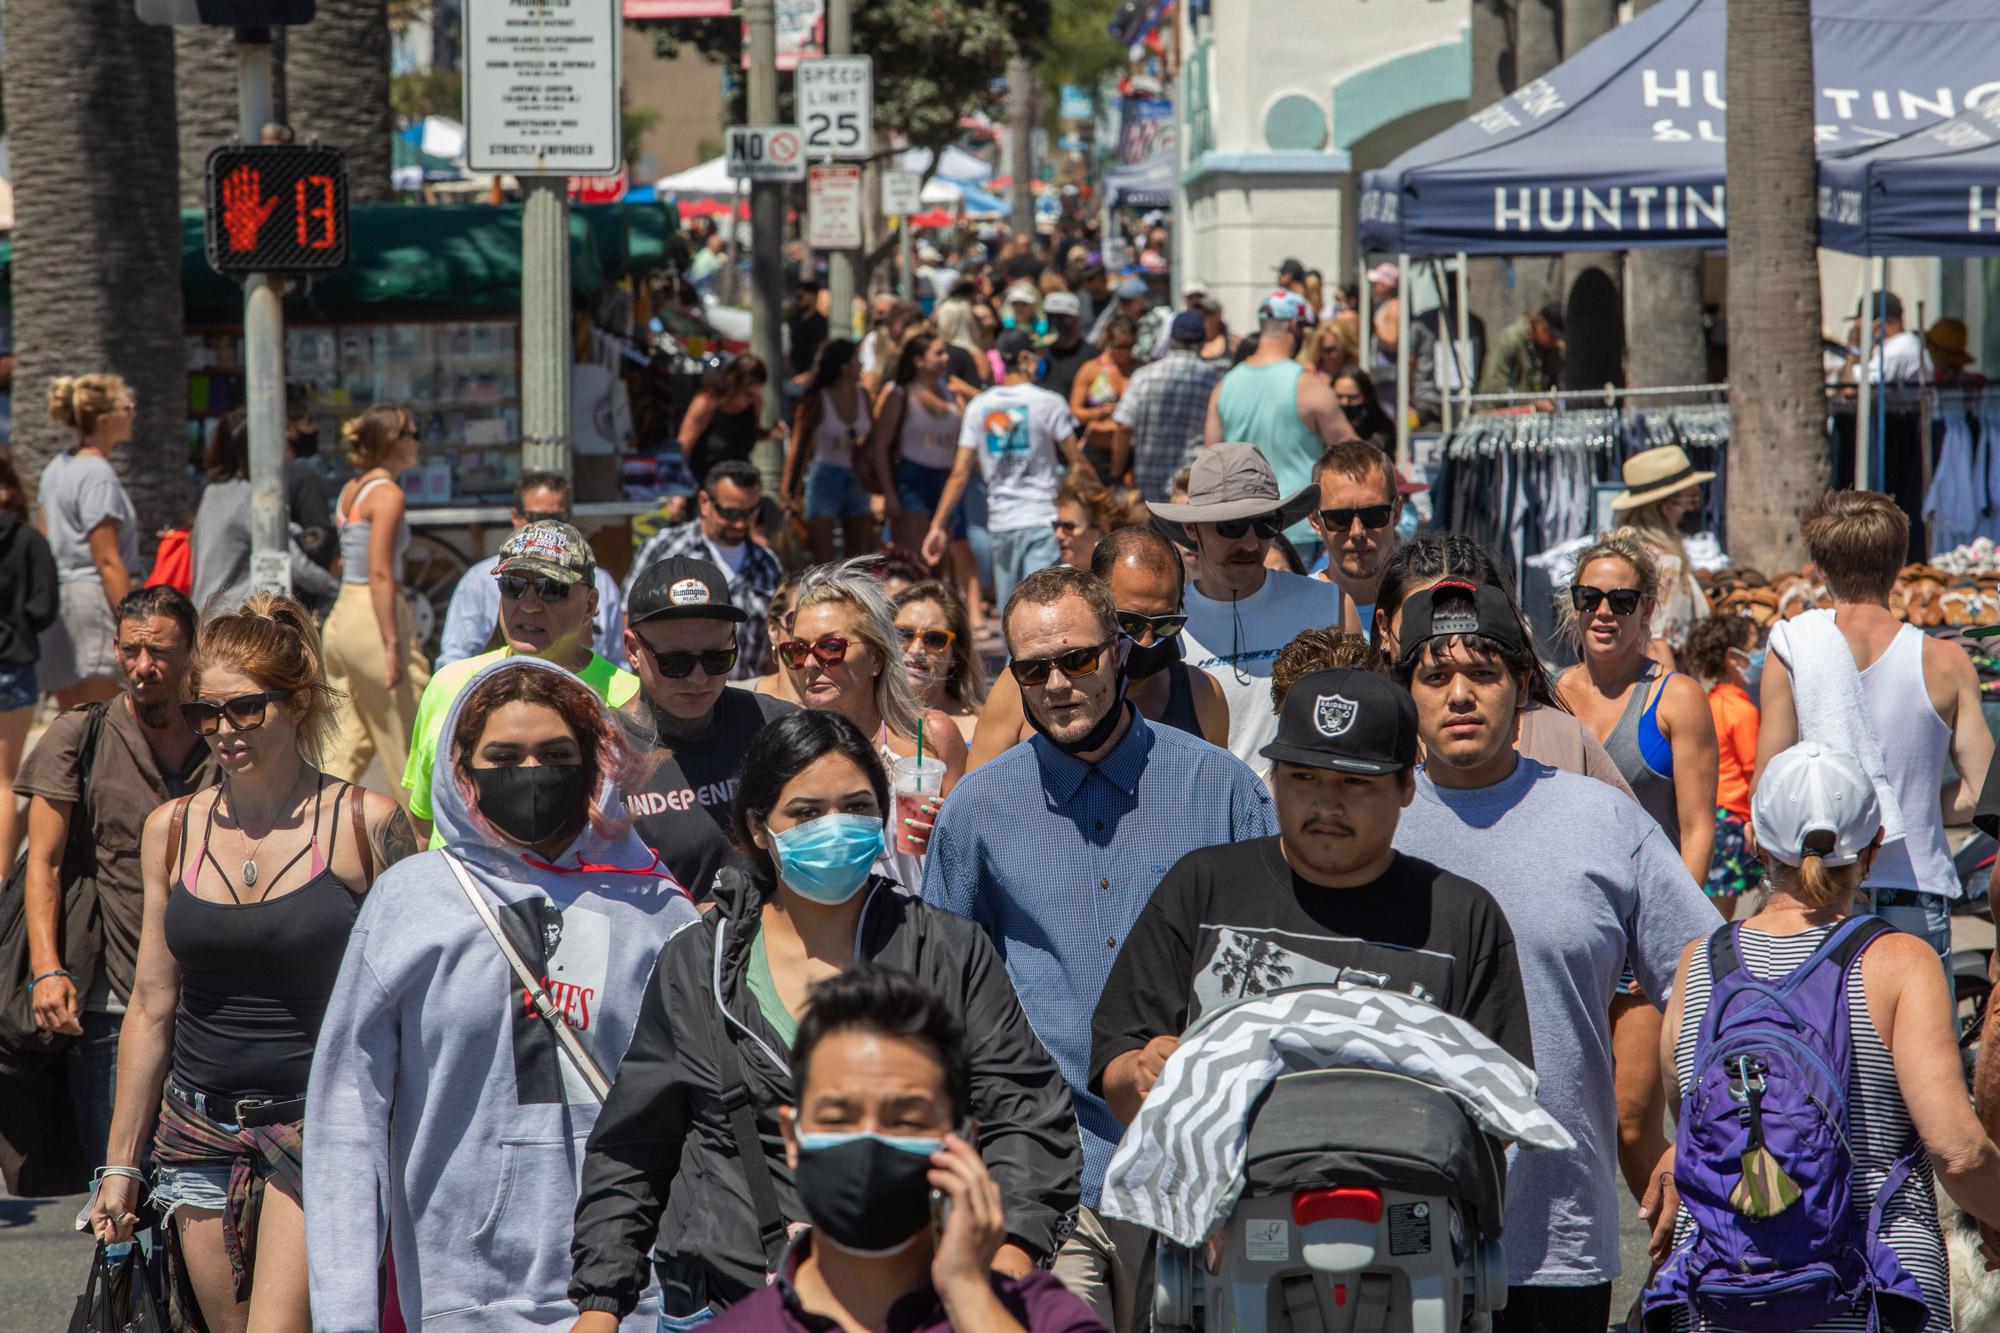 People cross the street in Huntington Beach, California, on July 19.